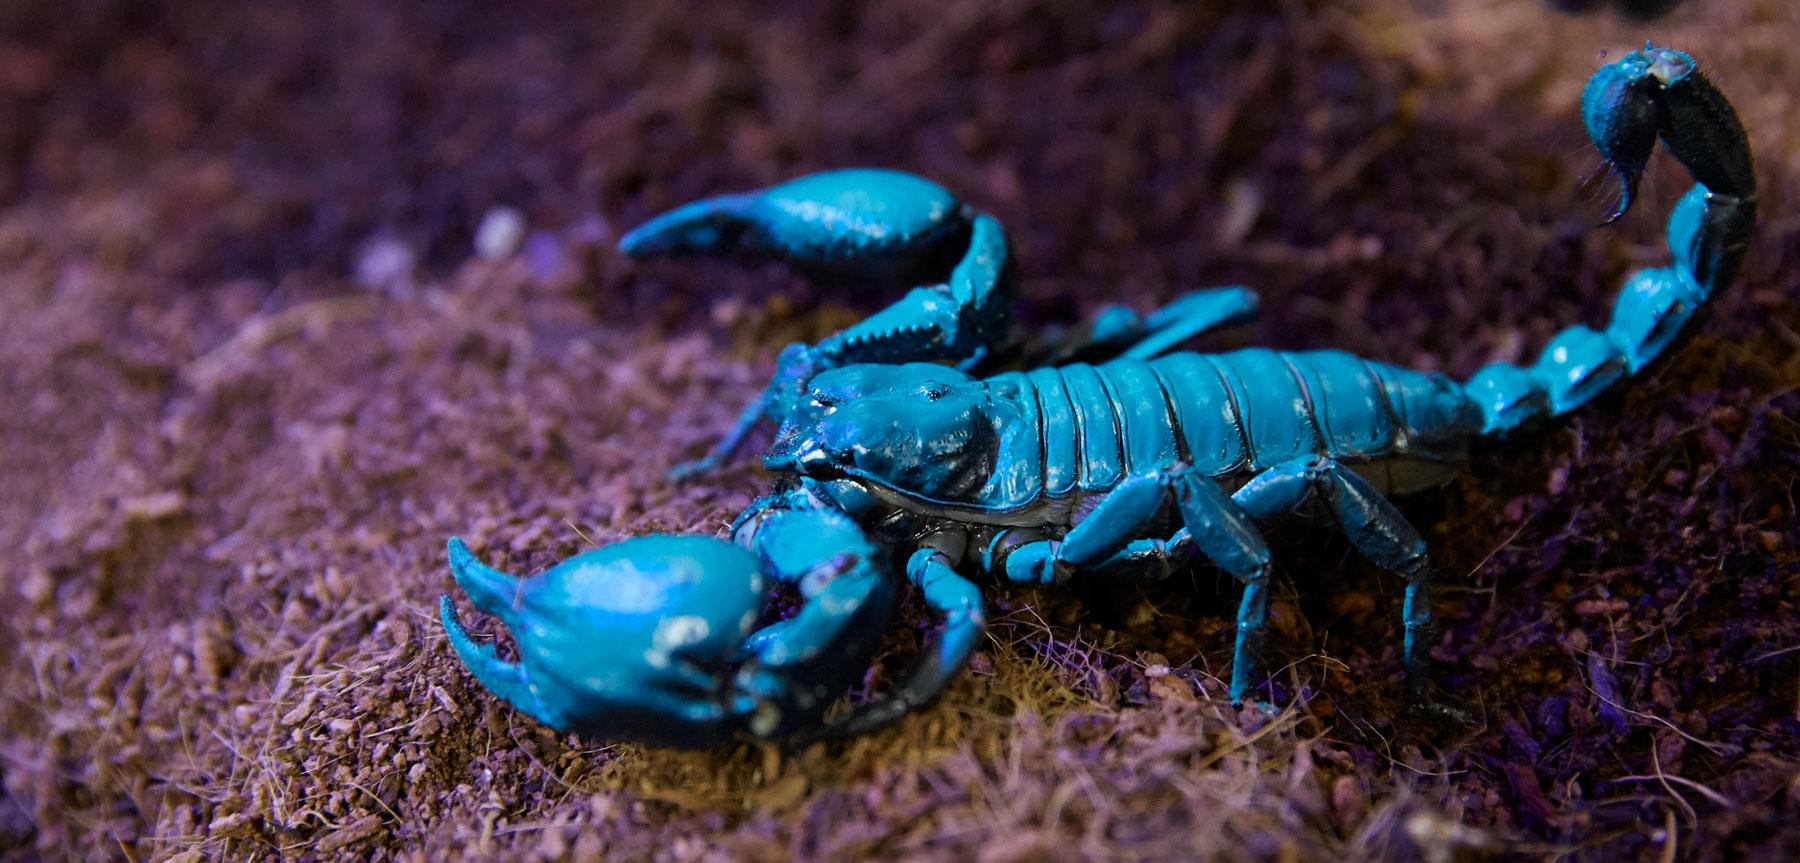 Scorpion Zoo Med Laboratories Inc